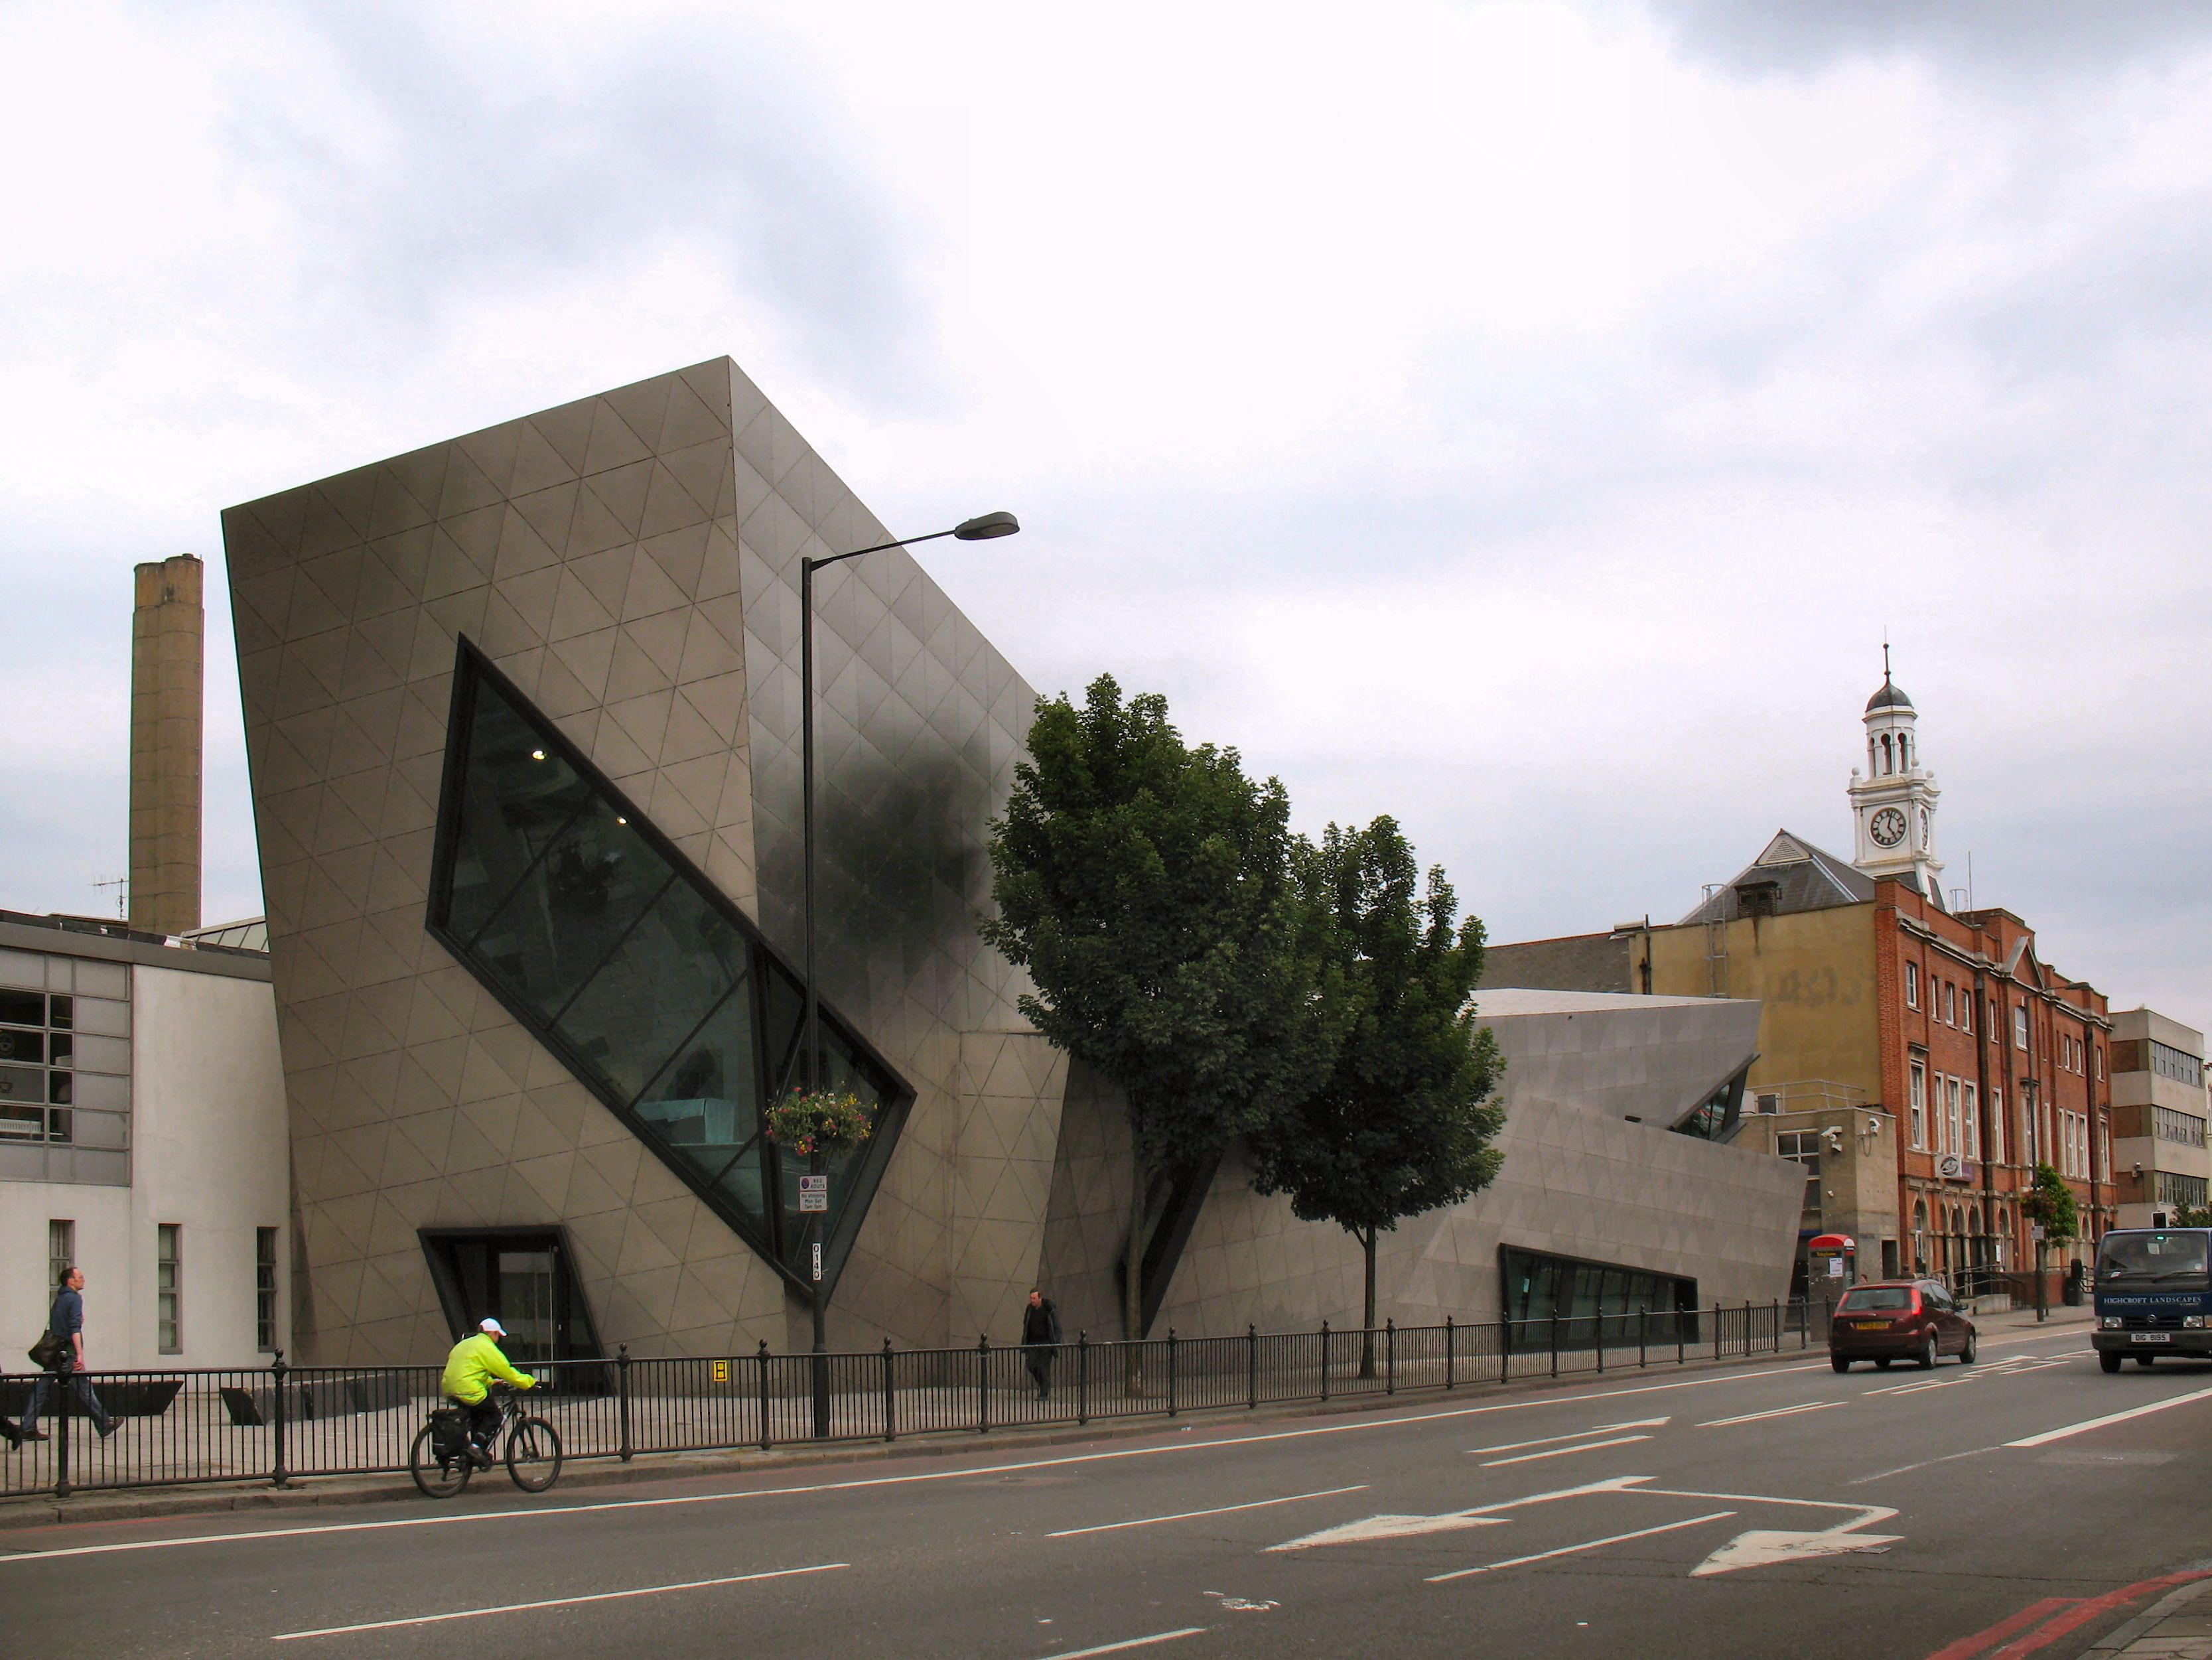 Orion Building Post Graduate Centre Of London Metropolitan University 9June2009 (3334 2502) Daniel Liebeskind